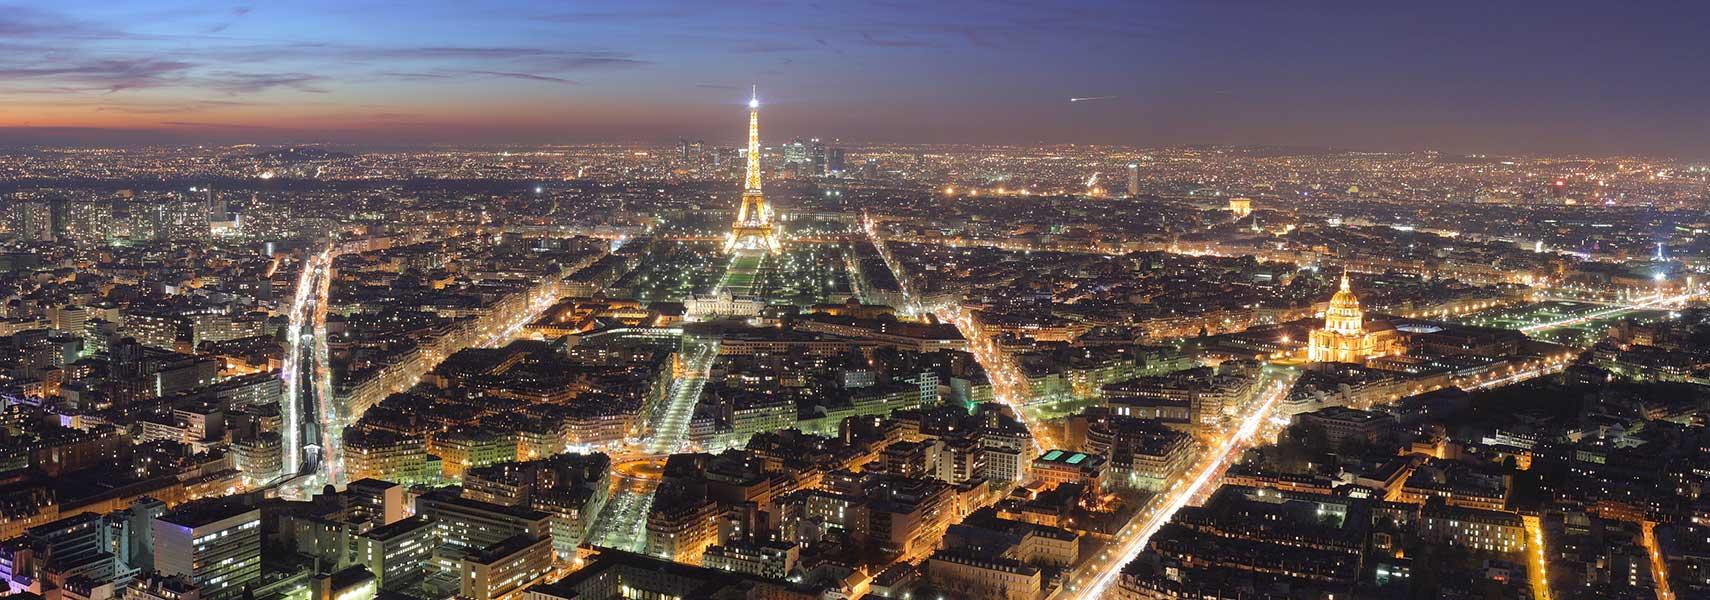 famous landmarks satellite view of the eiffel tower paris france